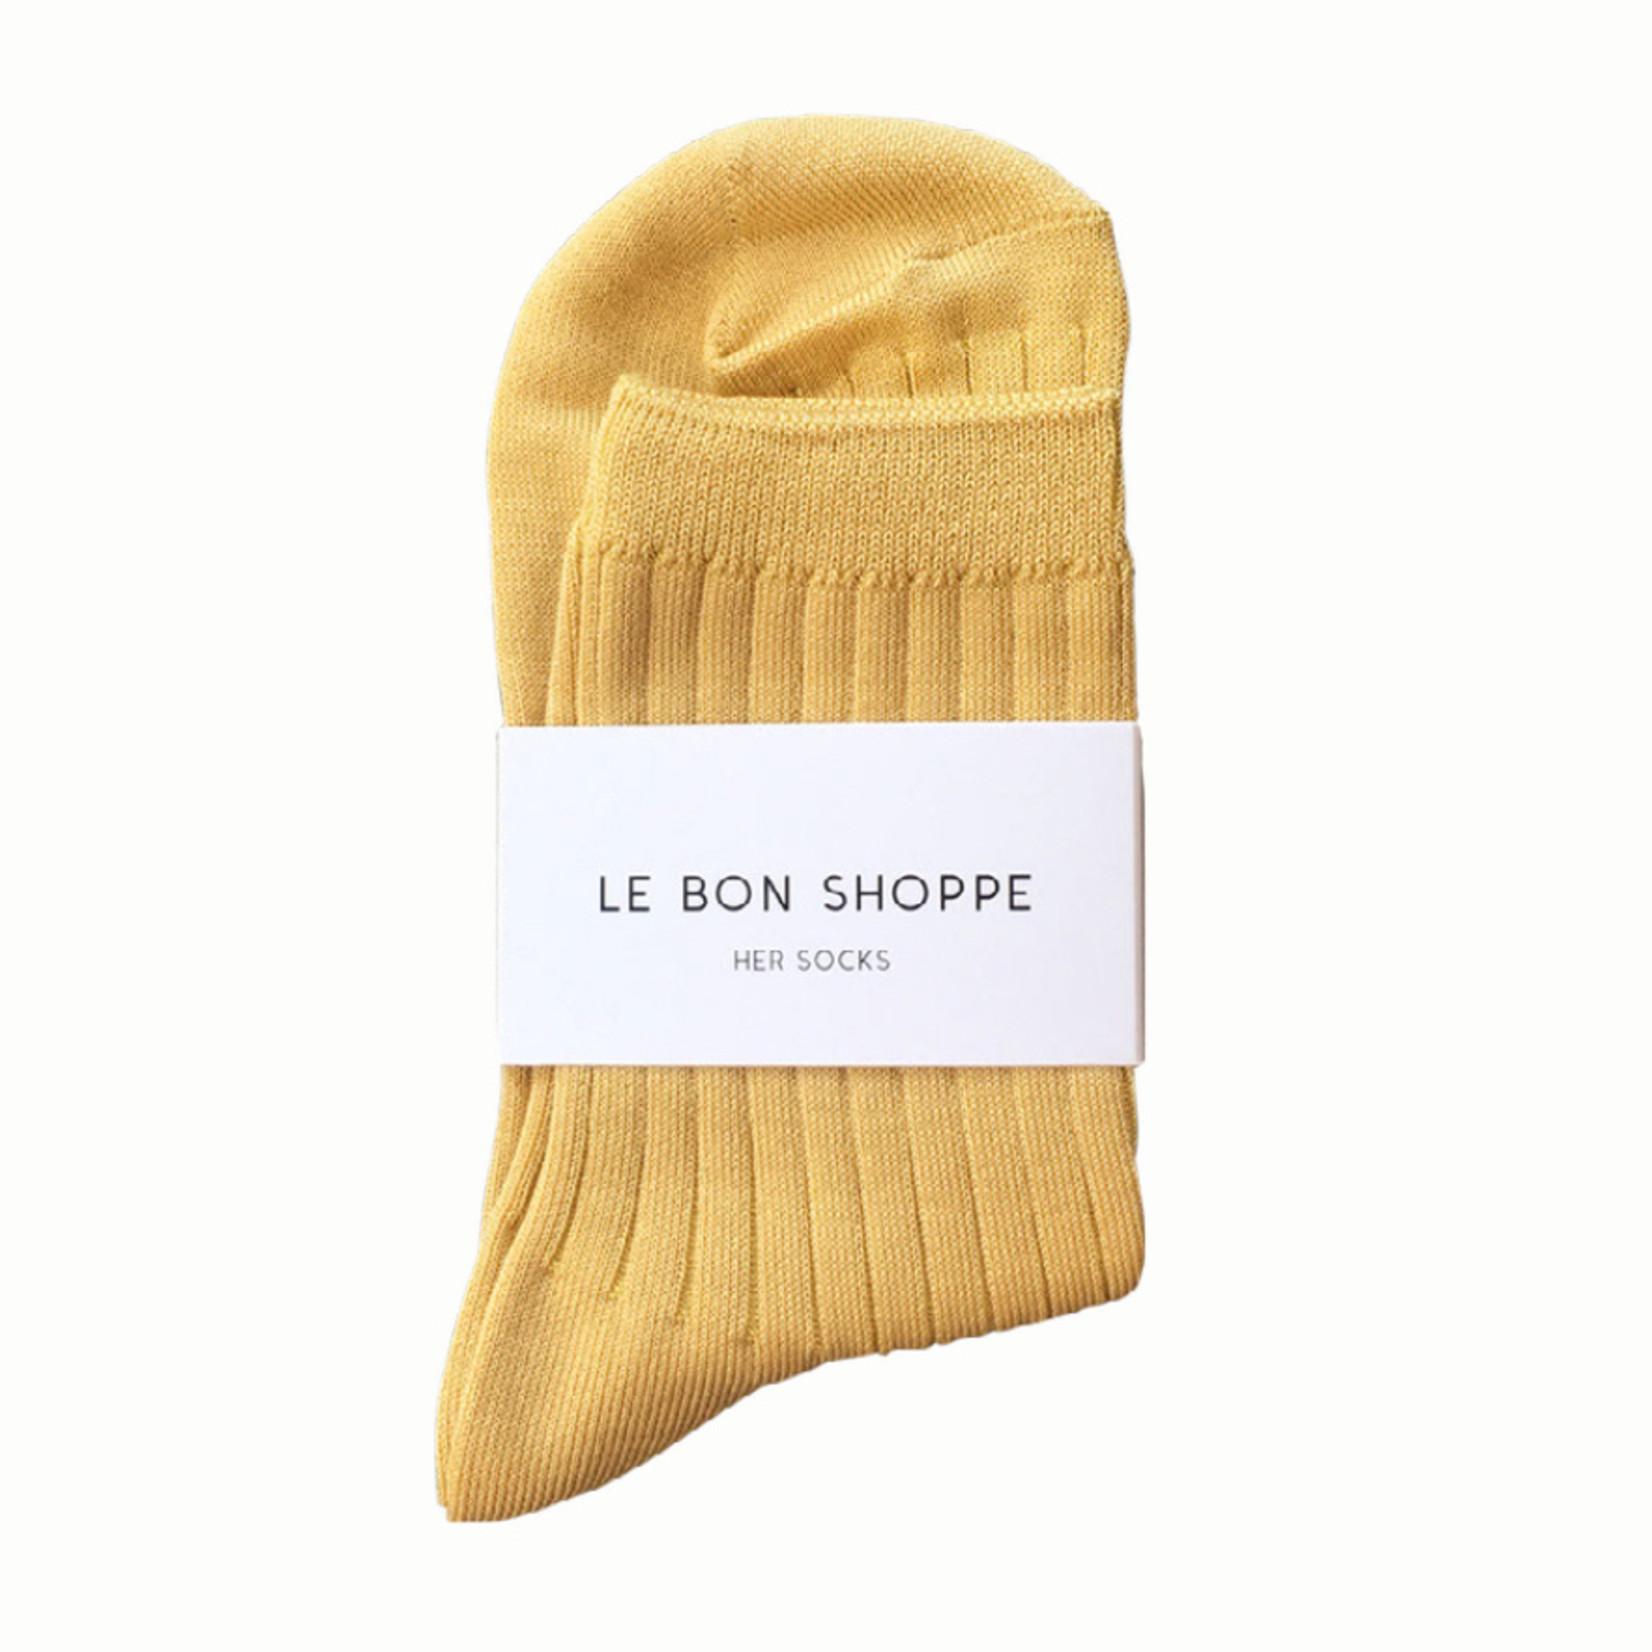 Le Bon Shoppe Her Socks Buttercup